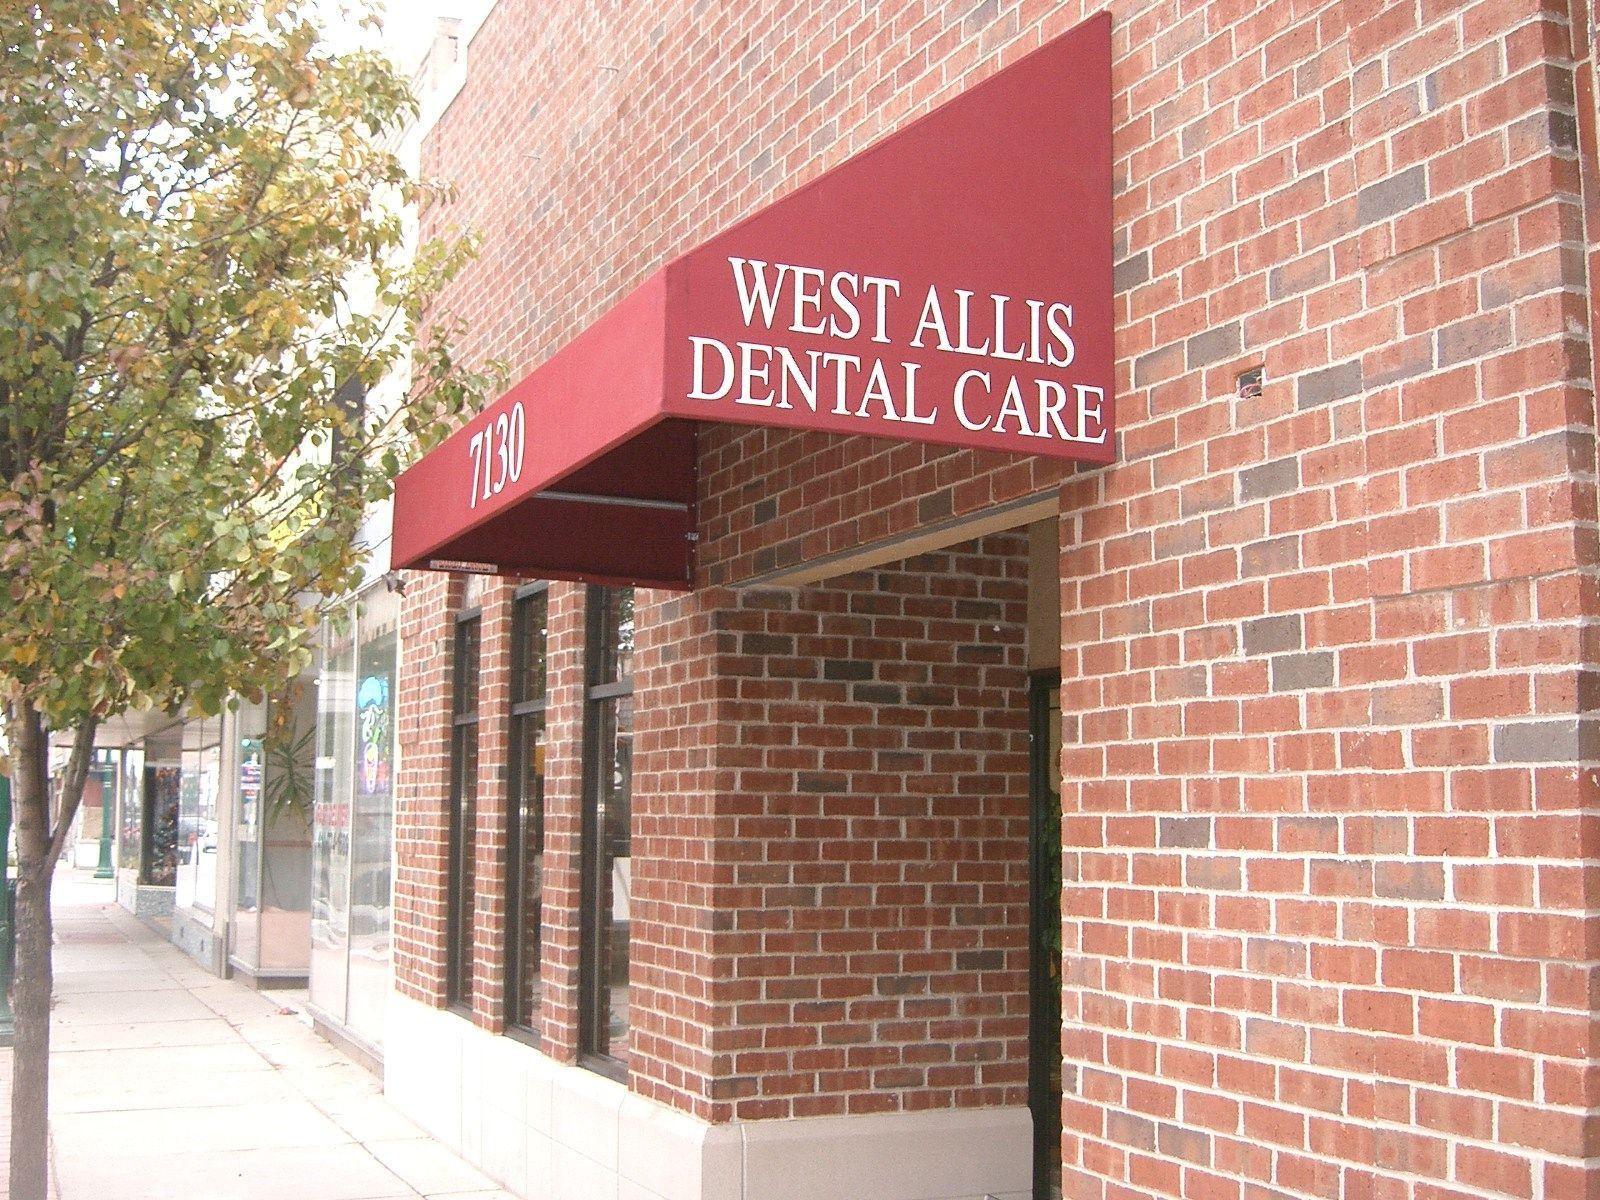 West Allis Dental Care 7130 W Greenfield Avenue West Allis Wi